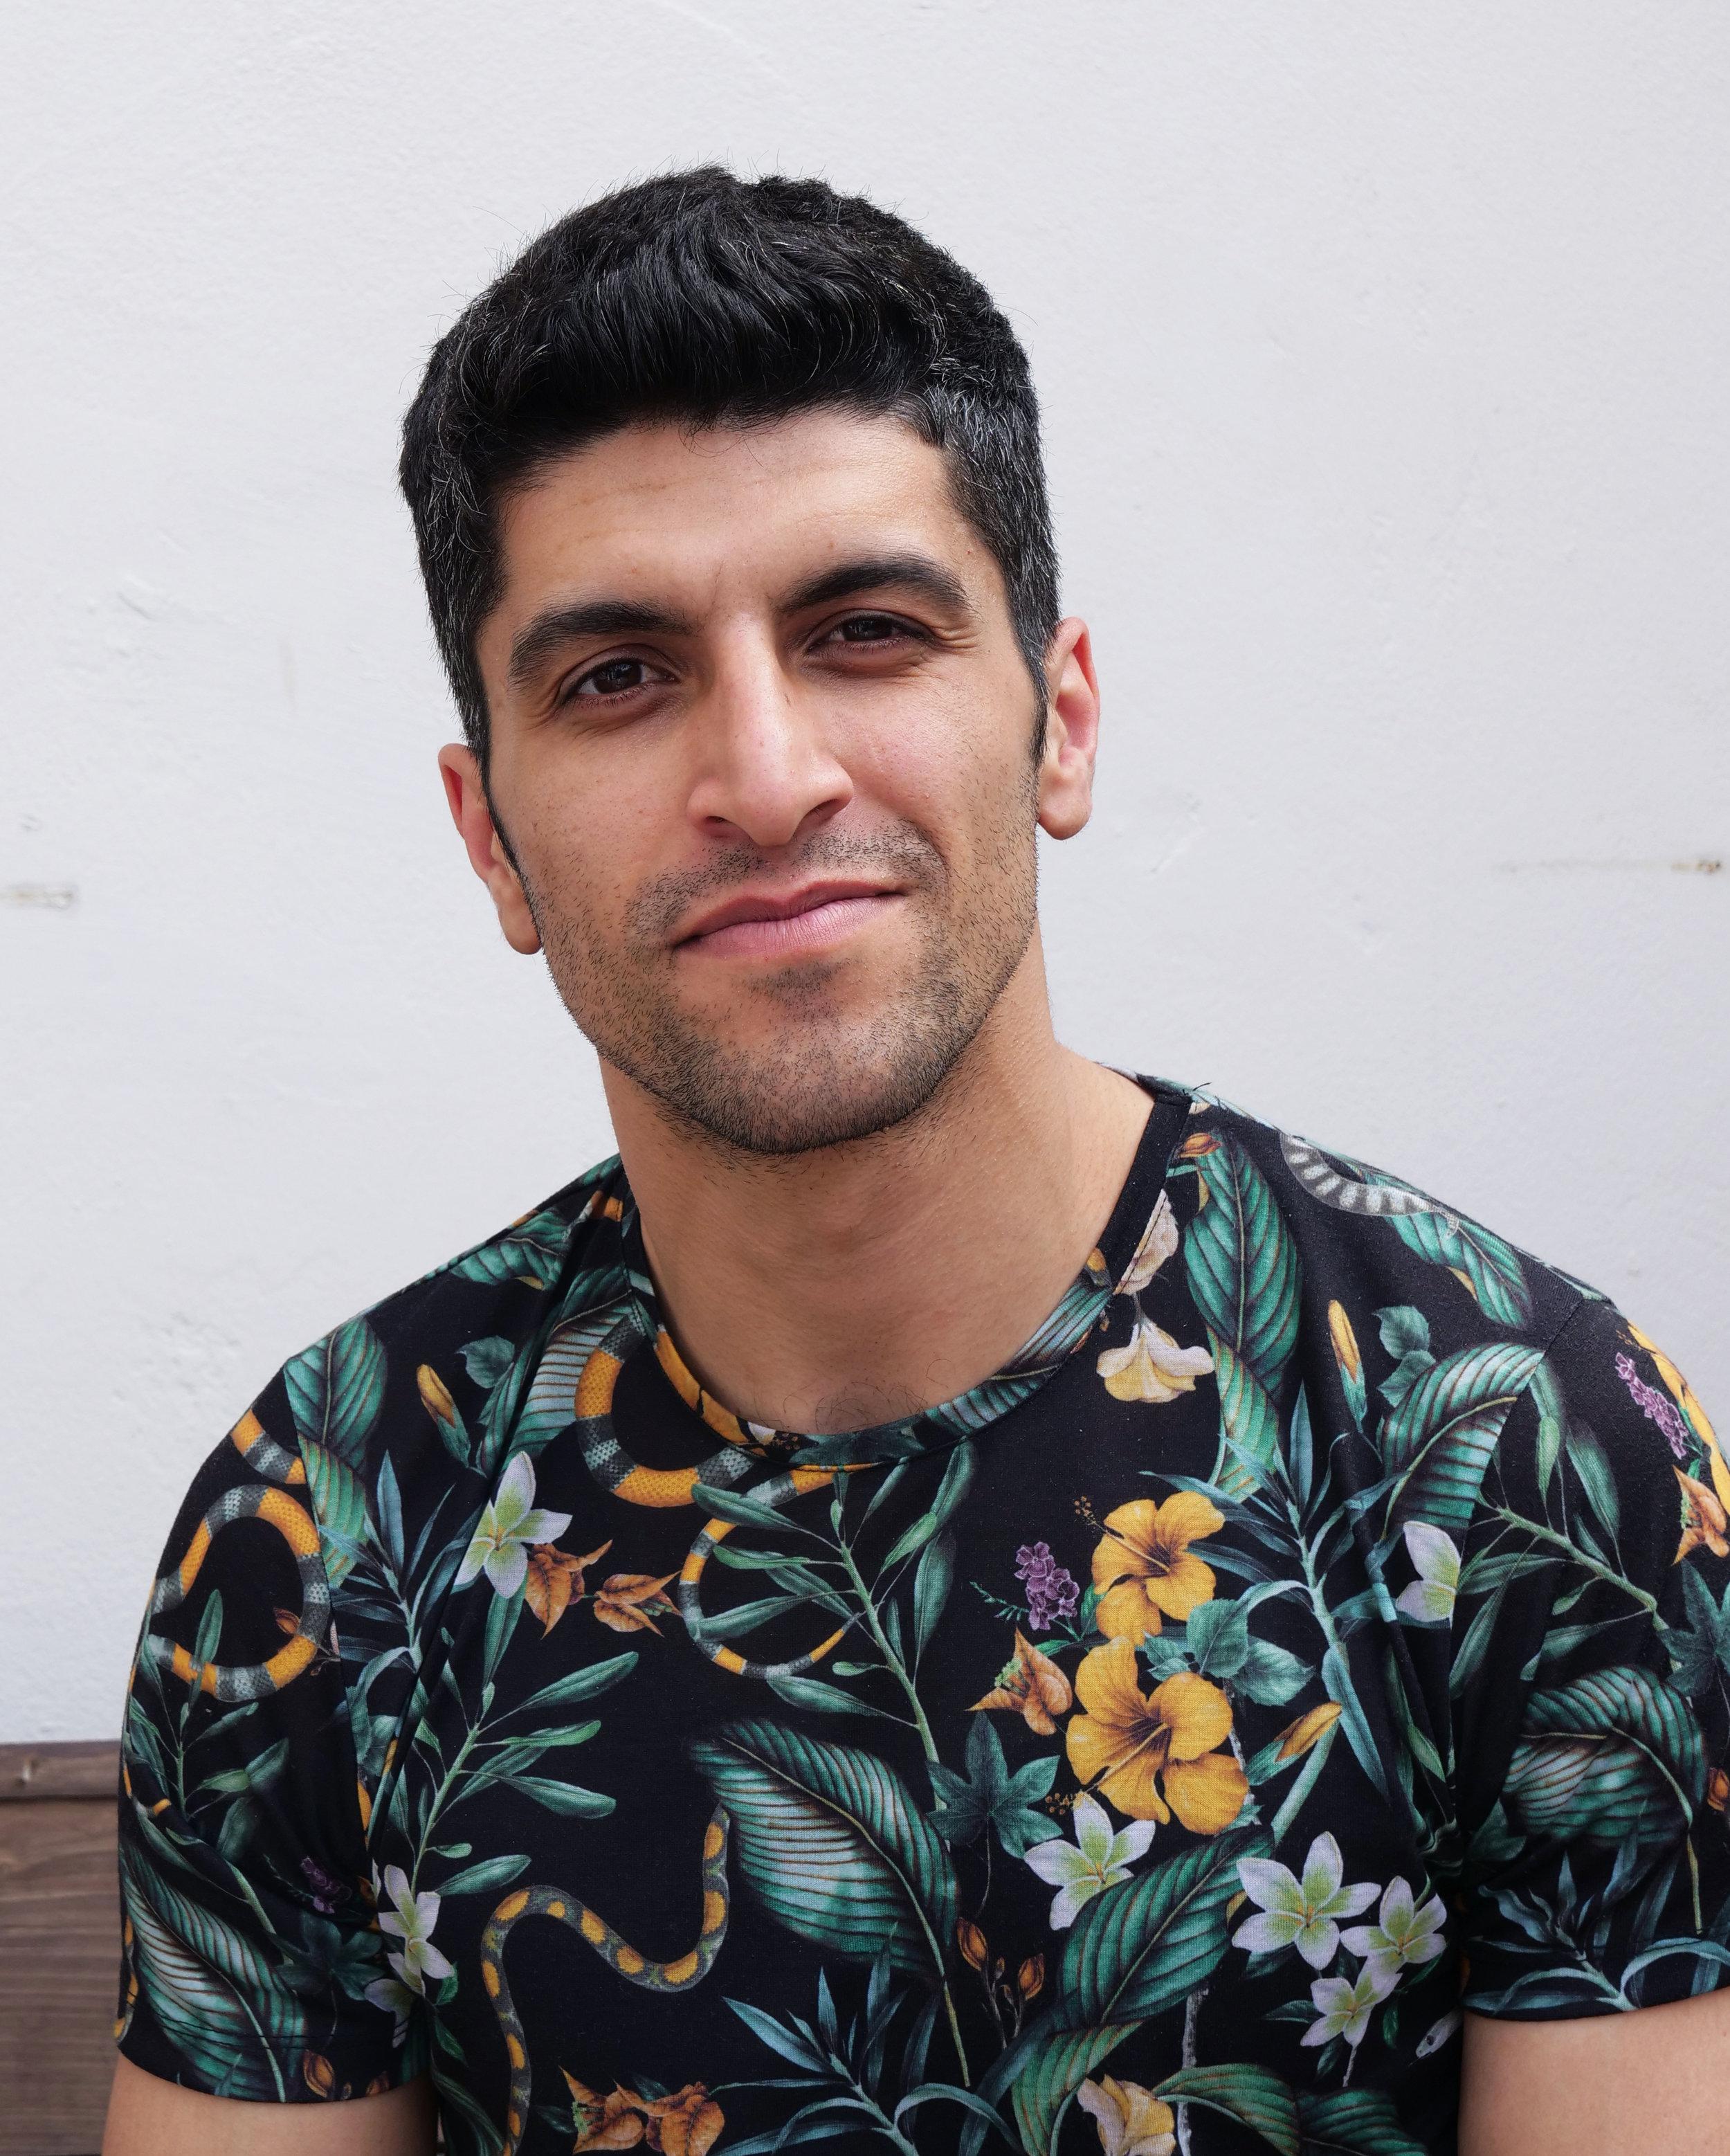 Reza participates in Trampoline House's entrepreneurship course to get closer to the job market. Photo: Viktoria Steinhart.